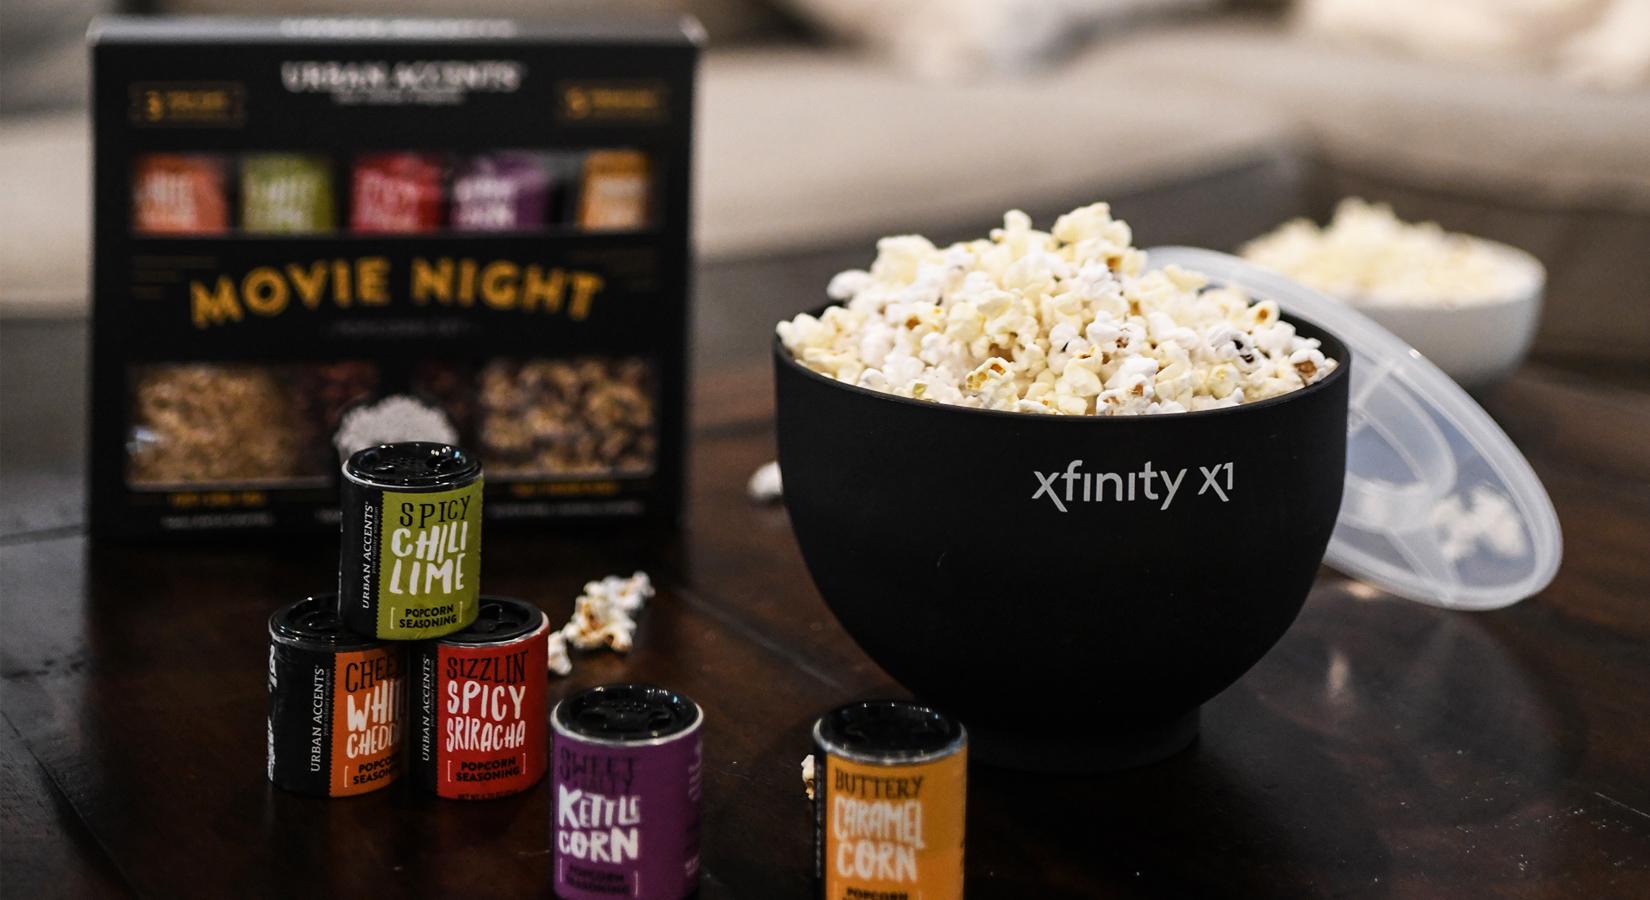 #25DaysOfGifting: Day 4 – Movie Night Gourmet Popcorn Gift Set